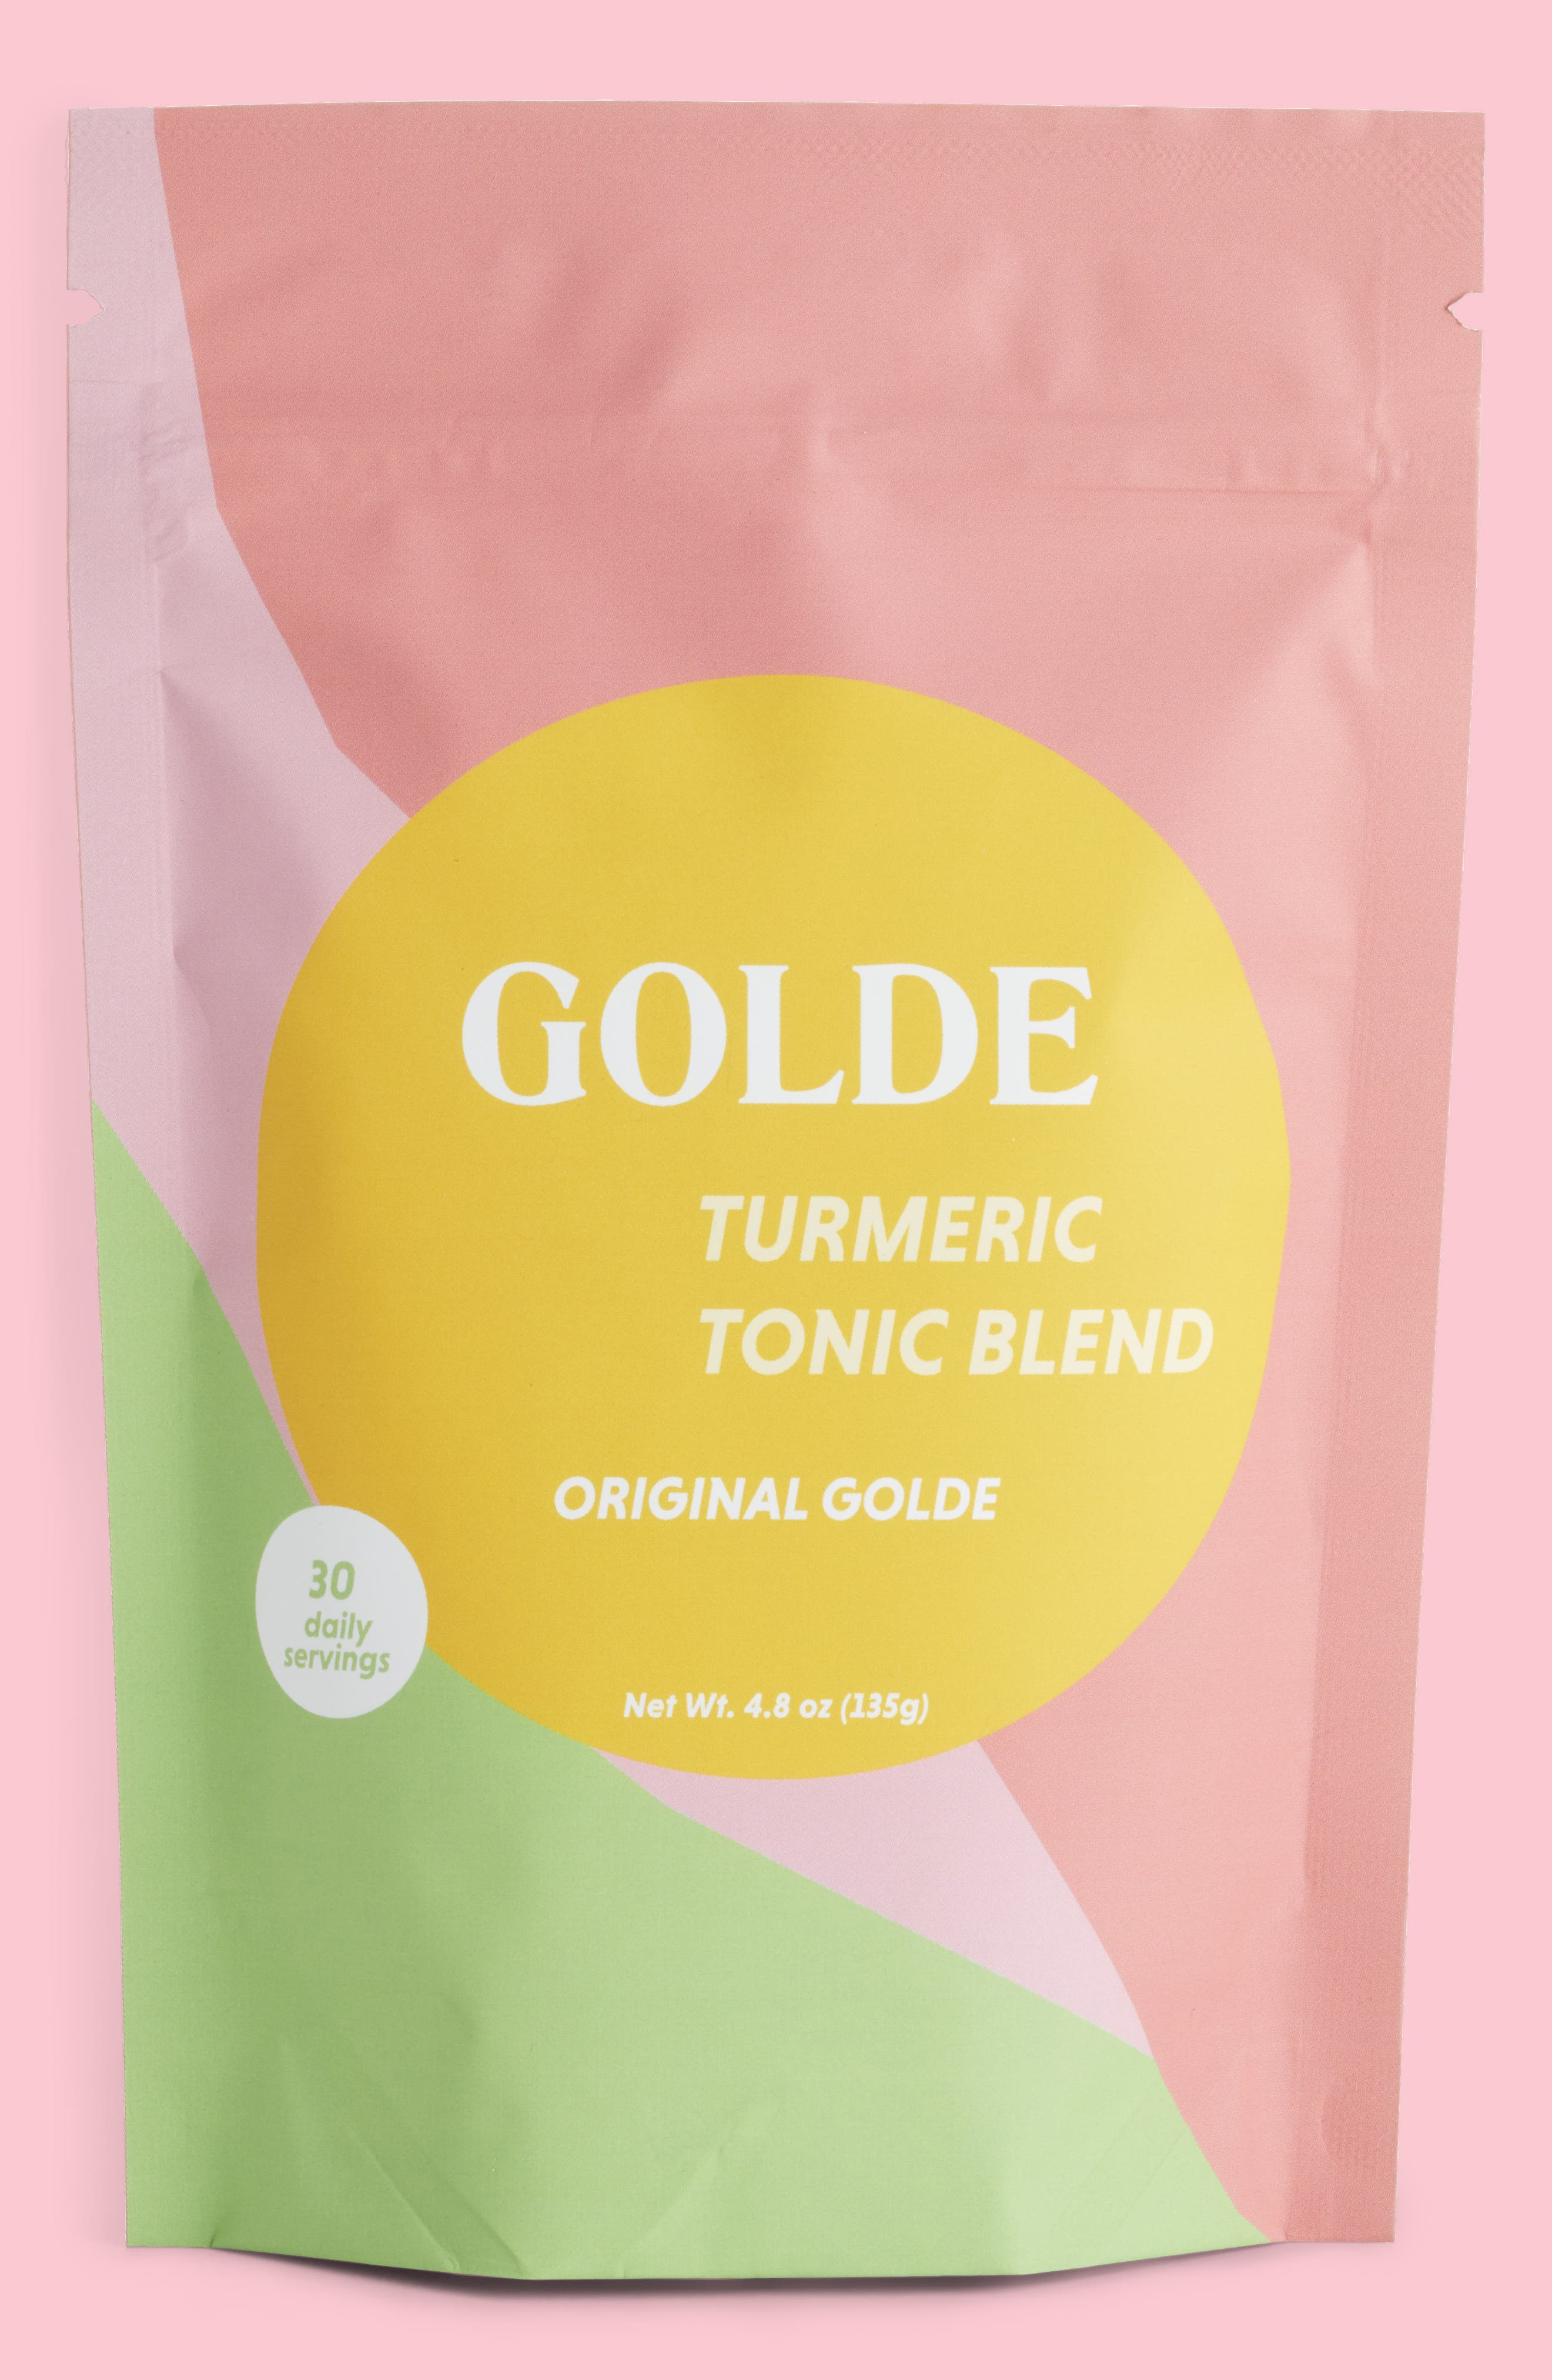 Golde Original Golde Turmeric Tonic Blend,                         Main,                         color, 000